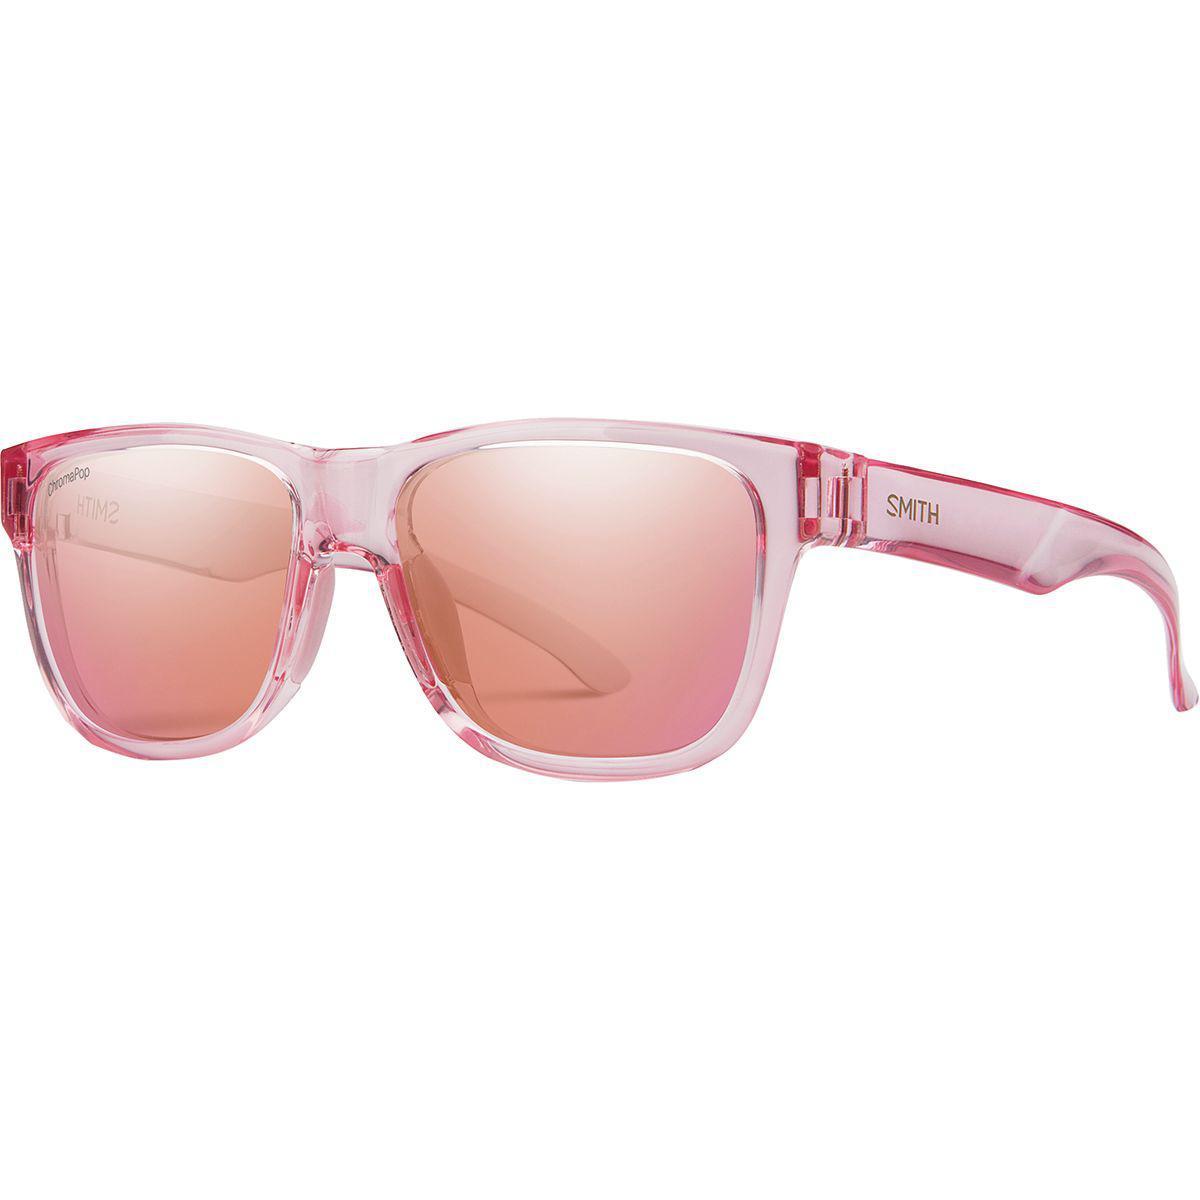 a5625c6a0a Smith - Pink Lowdown Slim 2 Chromapop Sunglasses for Men - Lyst. View  fullscreen